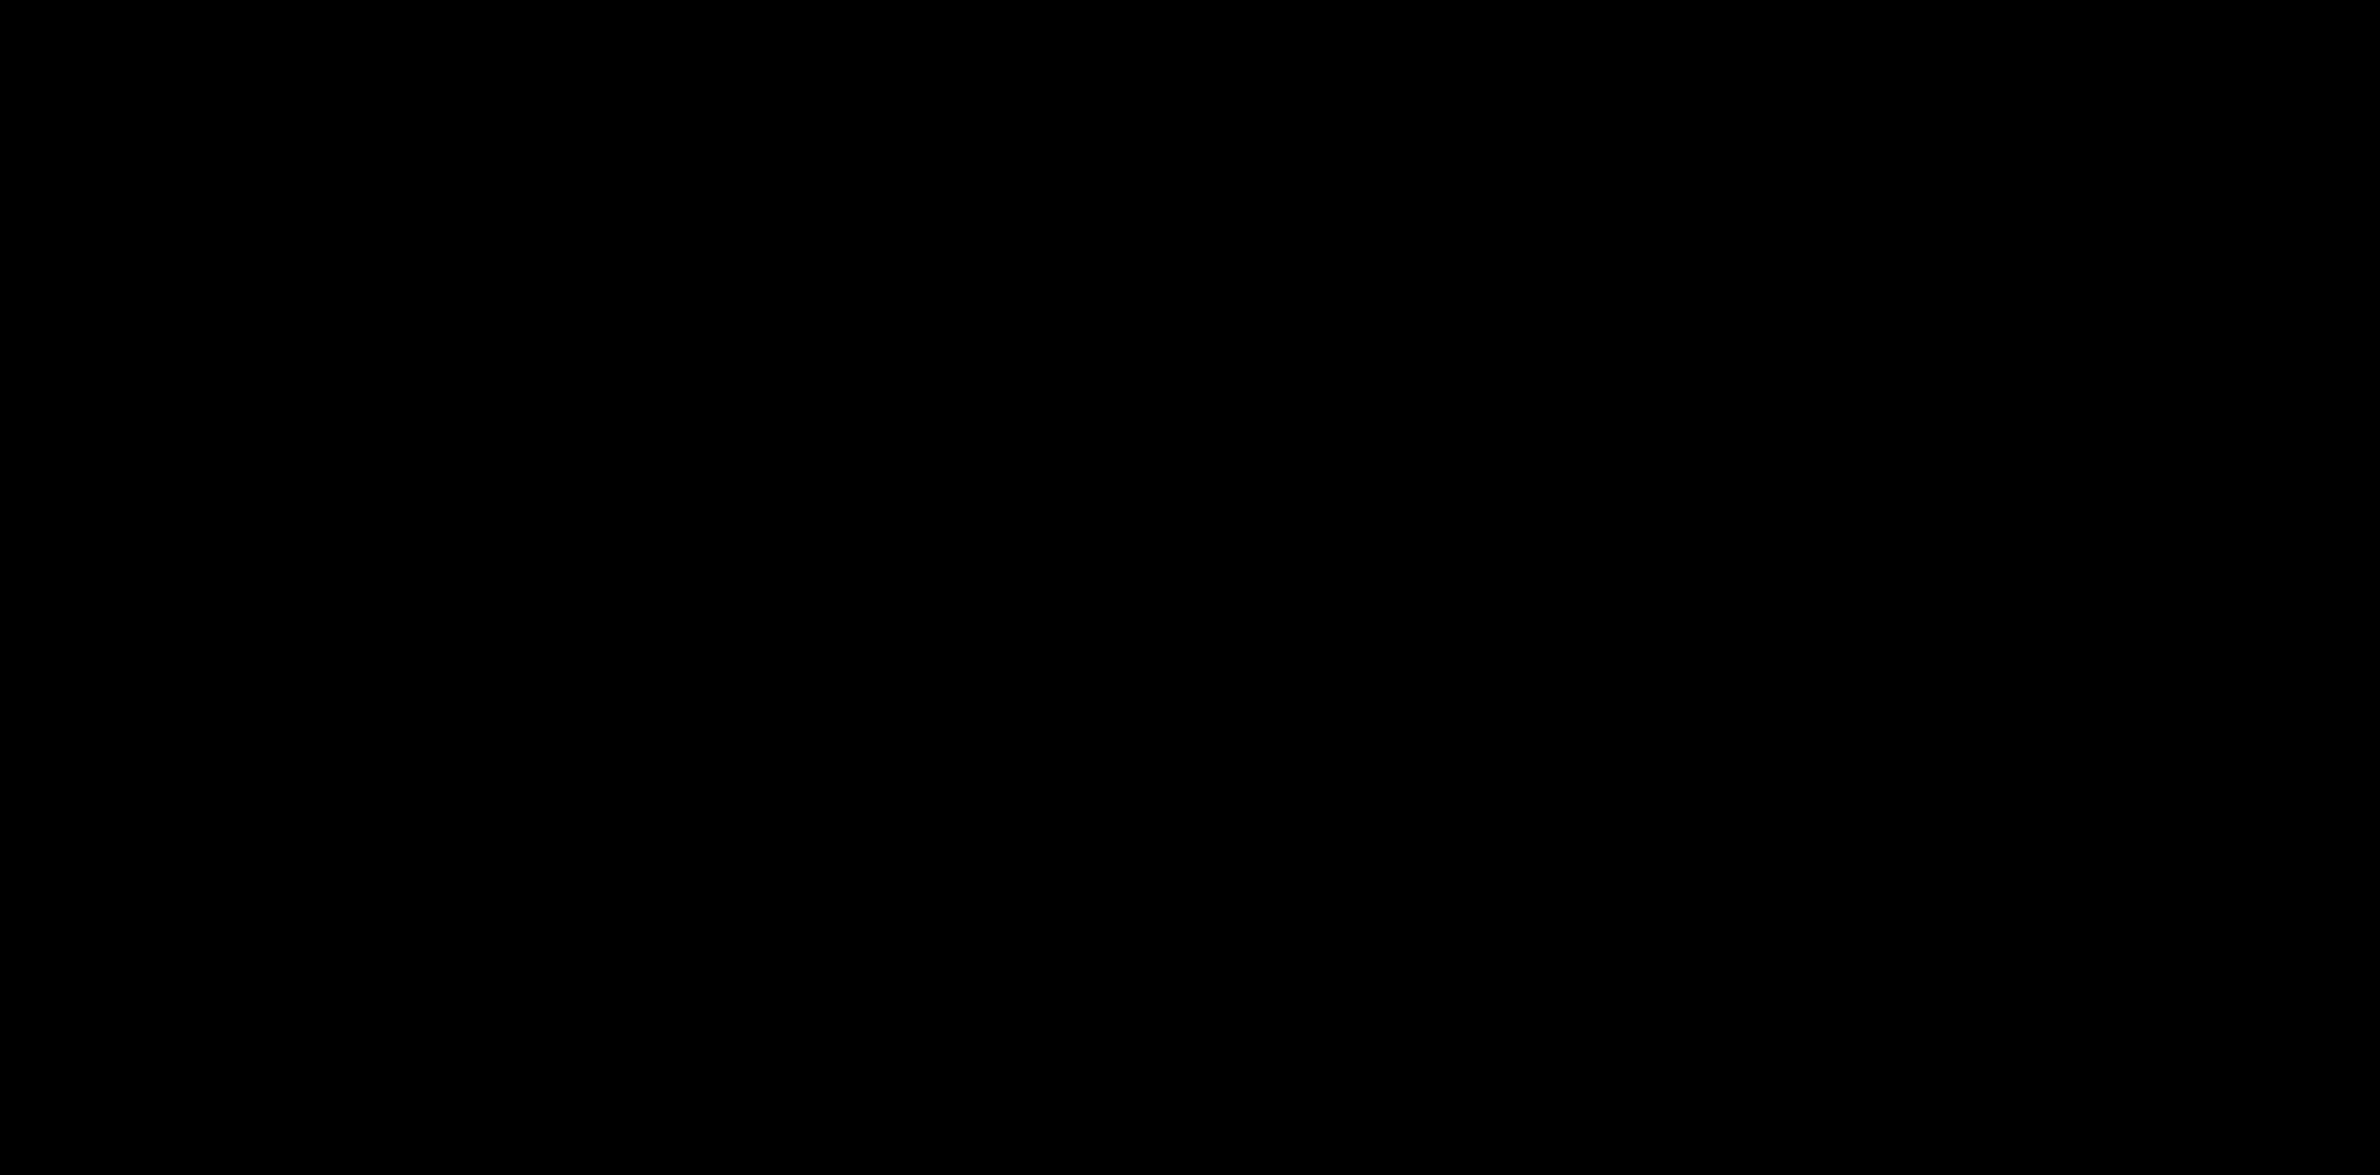 2380x1175 Clipart